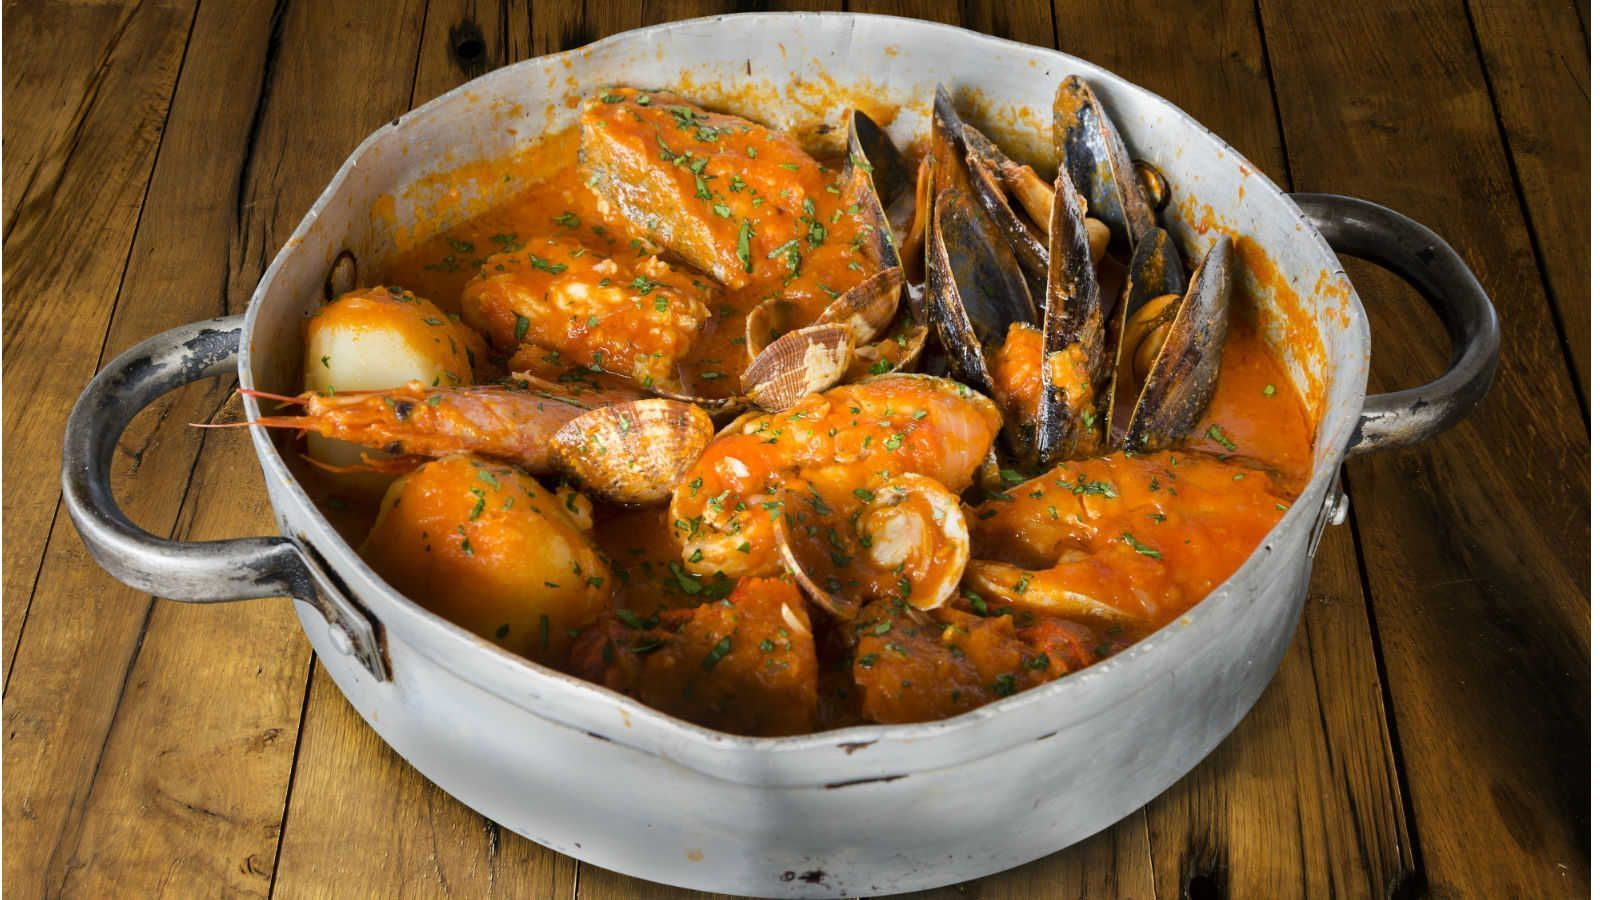 É importante respeitar o tempo de cozimento dos diferentes tipos de frutos do mar